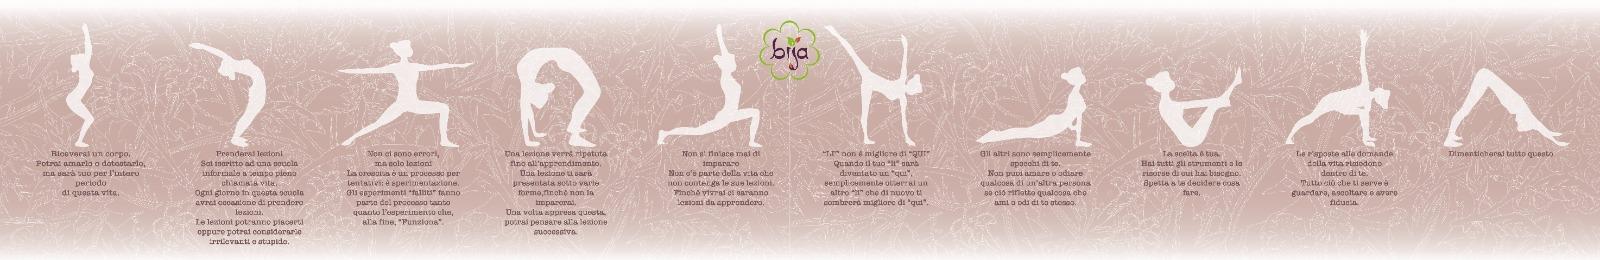 Saluto al sole Yoga Surya Namaskar Bija Casalpalocco